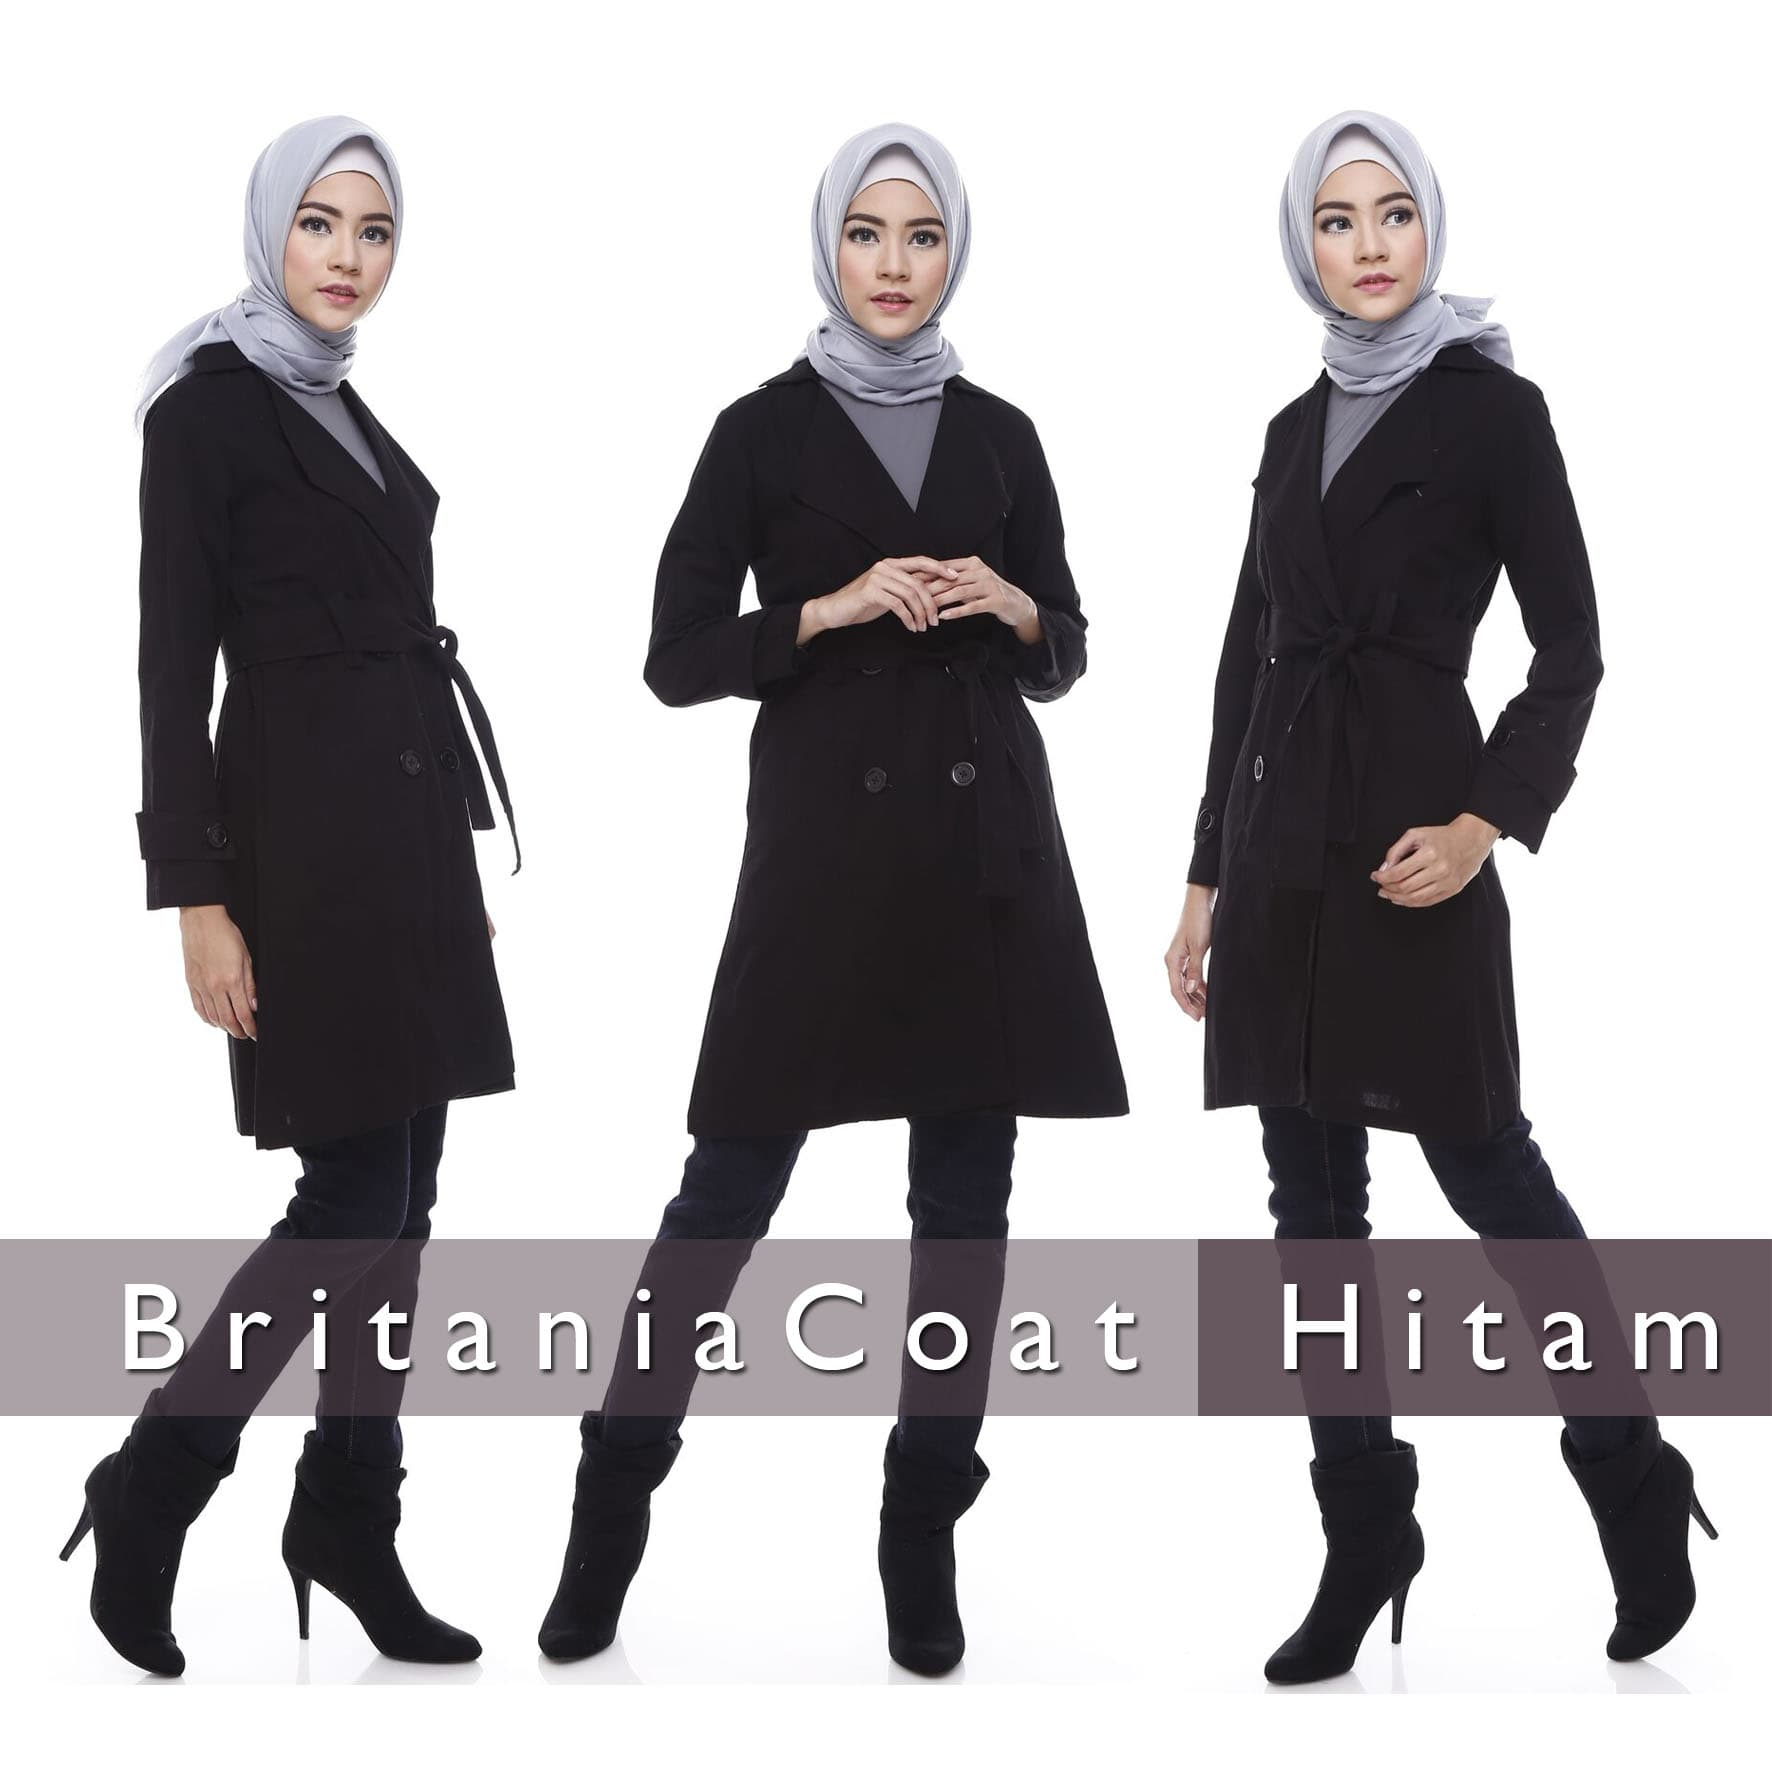 MURAH Jaket Wanita Muslimah Blazer Coat Korea Hitam Grayscale 4L fec8953871